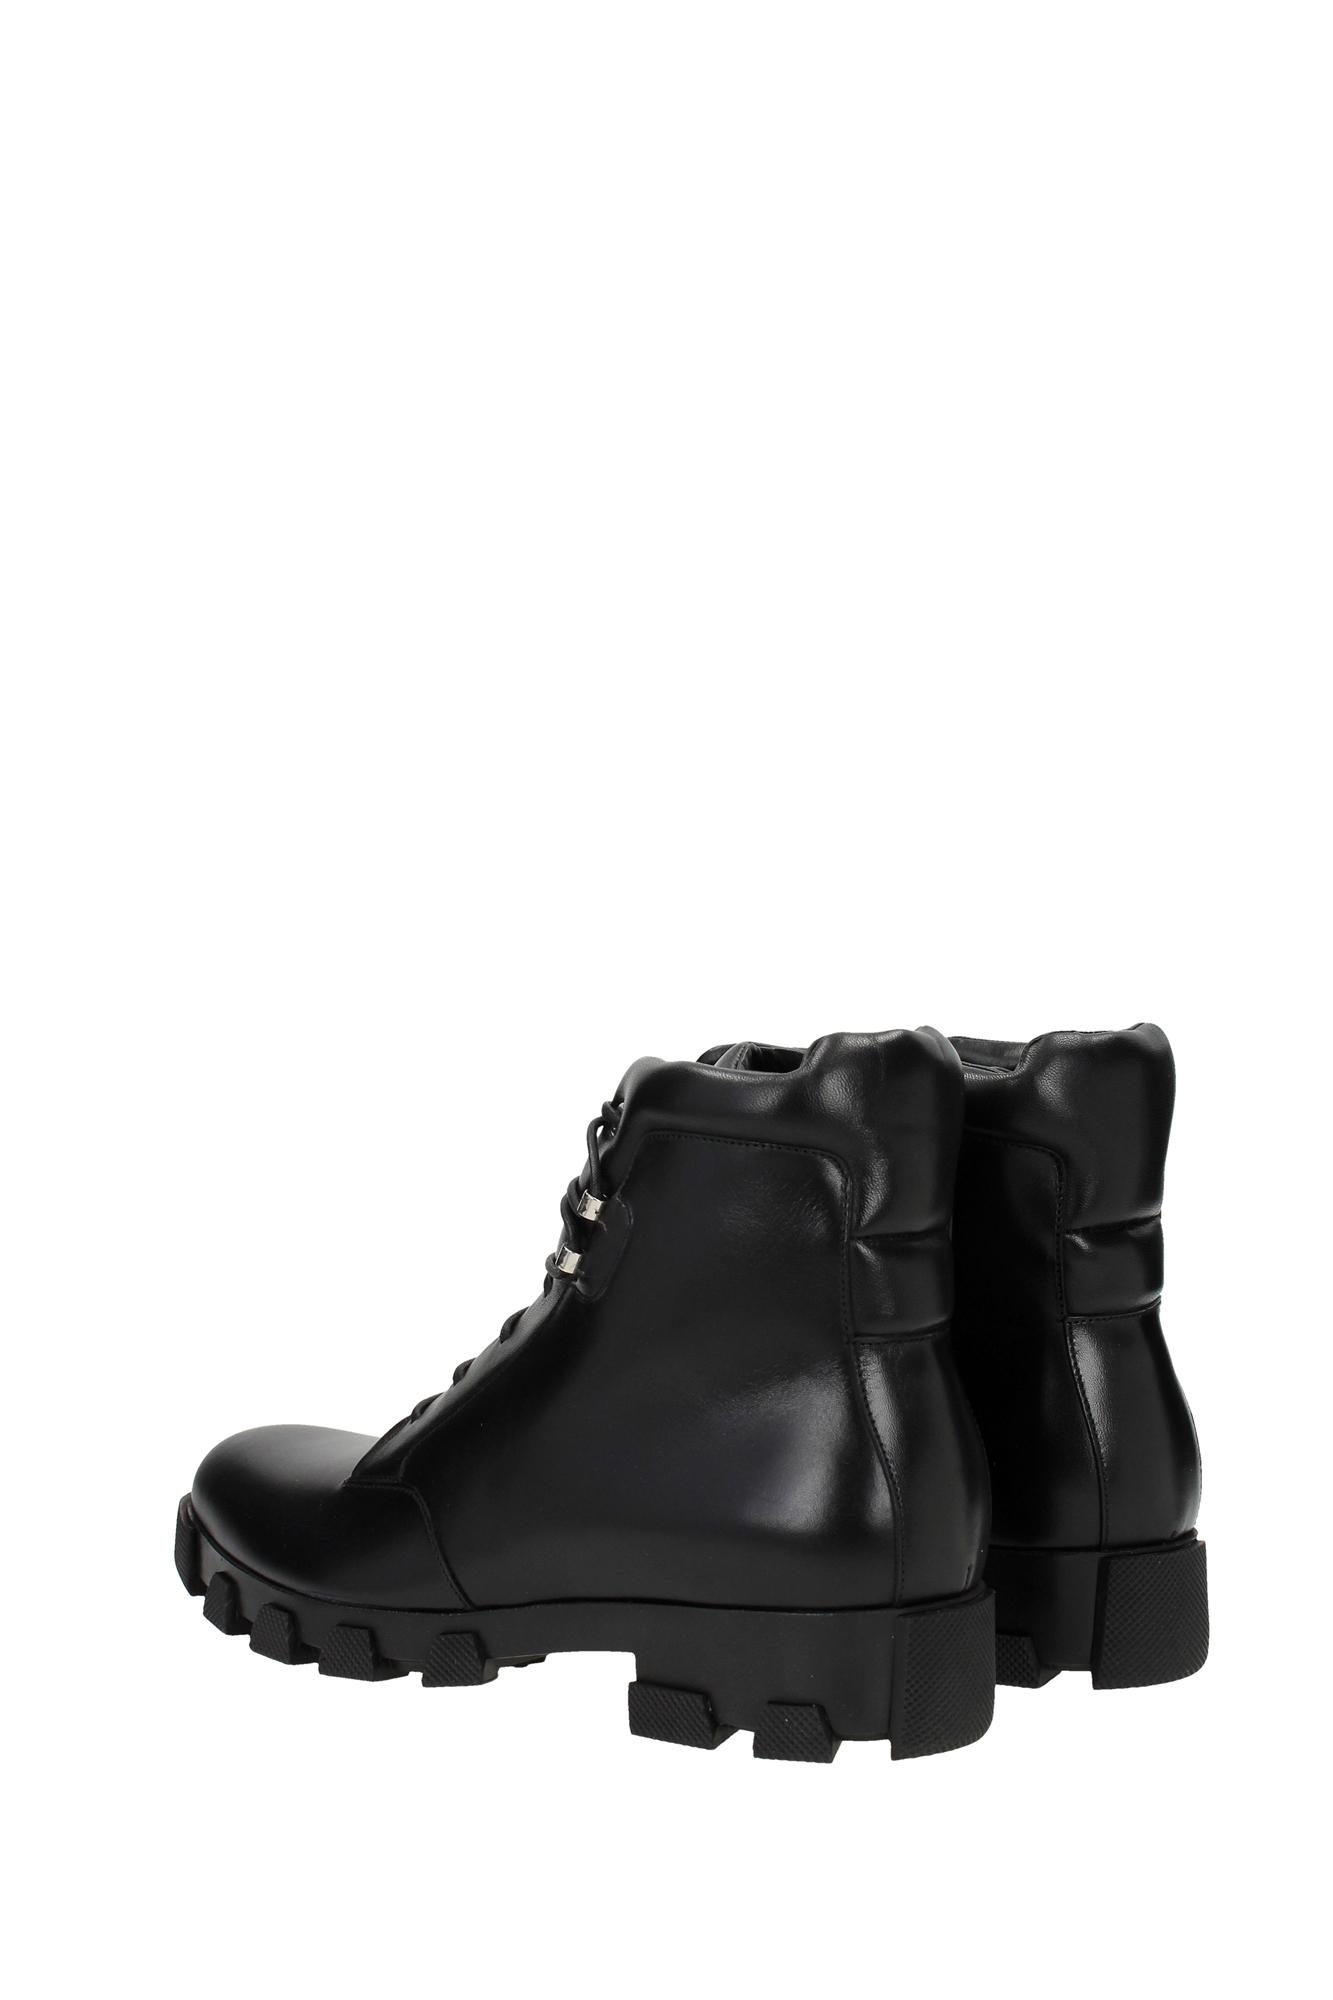 Ankle Boots Balenciaga Men Leather Black 391235WAV921000 | eBay